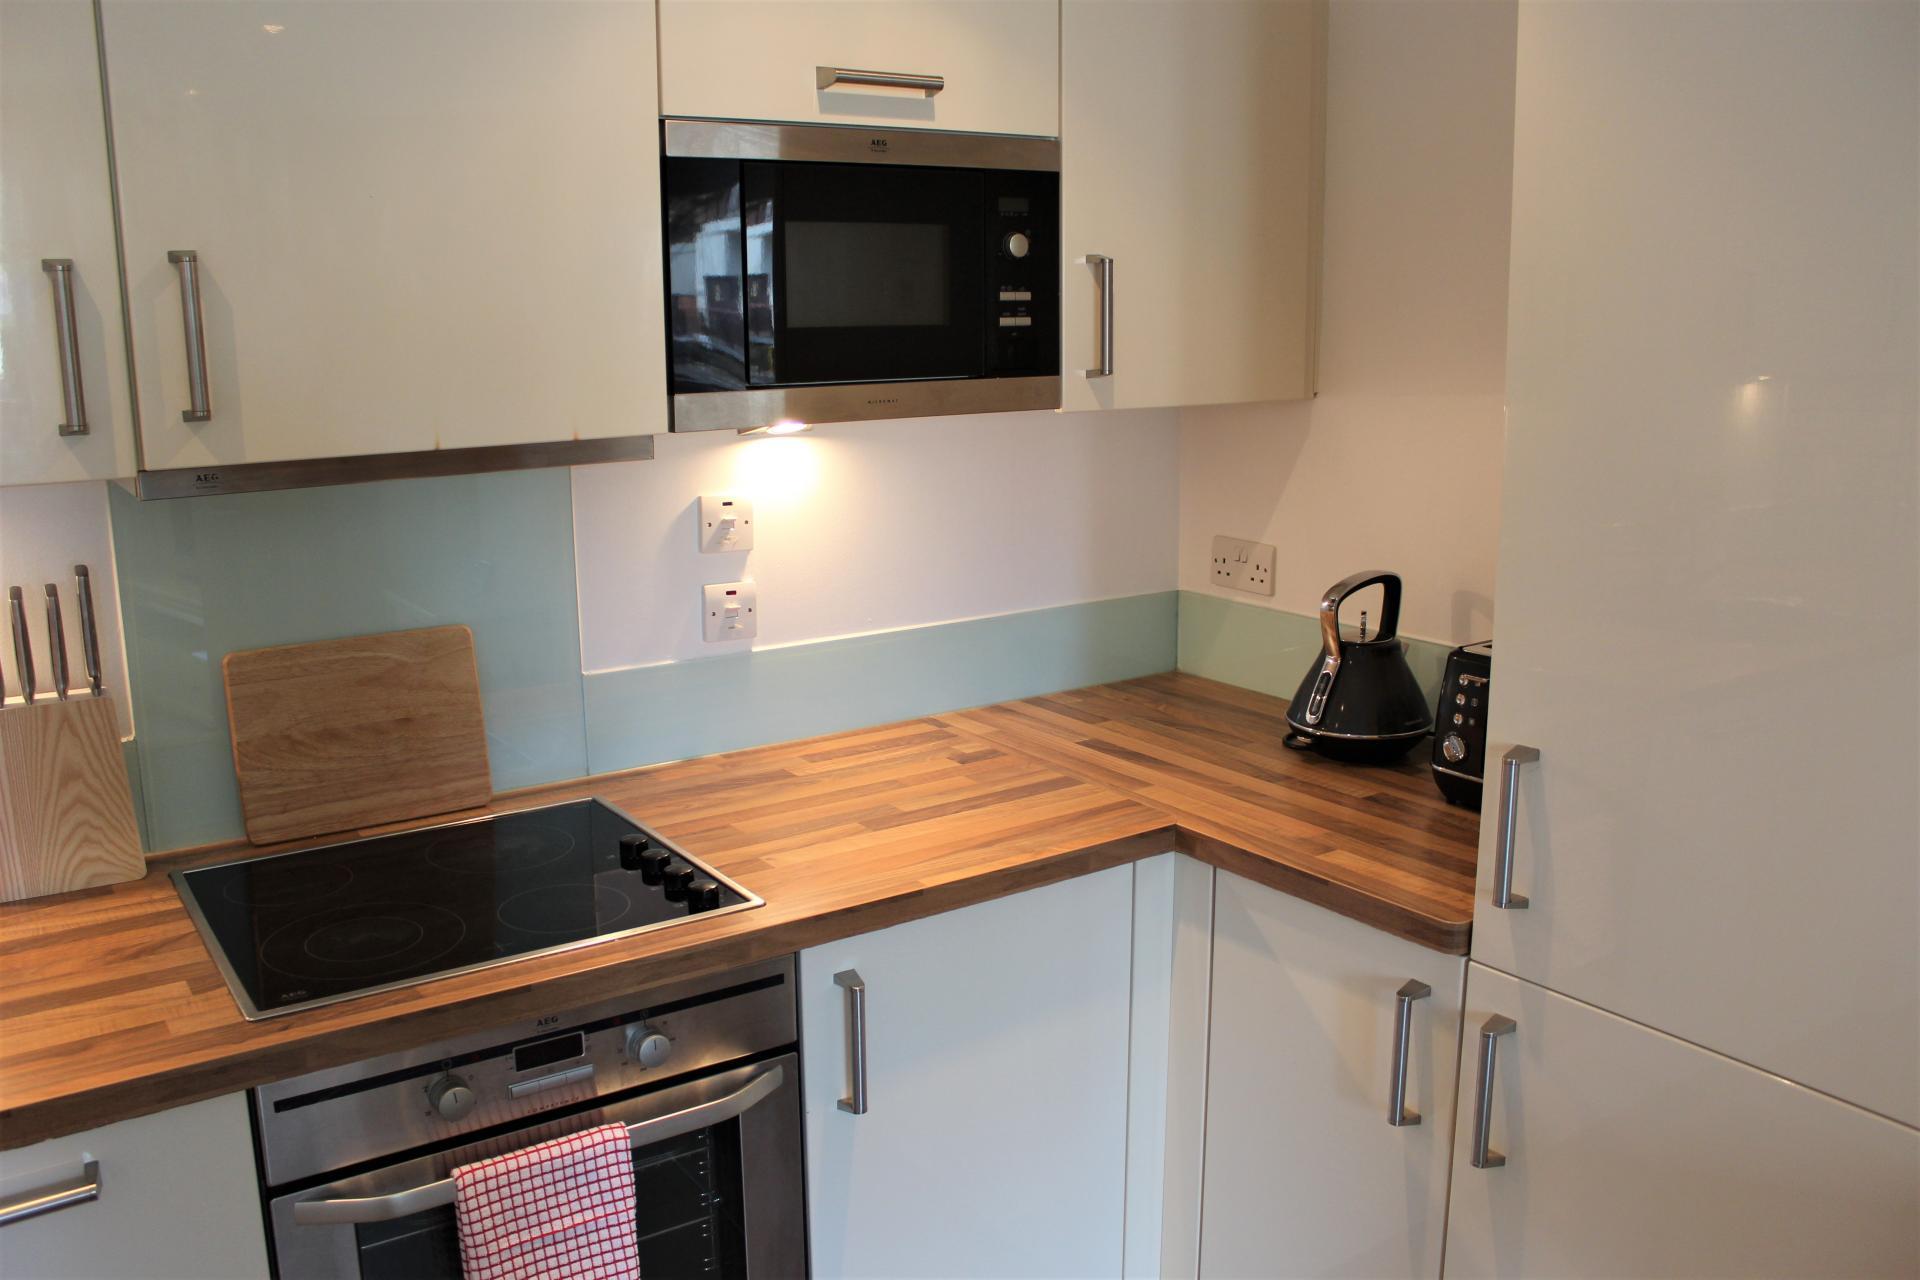 Kitchen at Gunwharf Quays Apartments, Gunwharf Quays, Portsmouth - Citybase Apartments